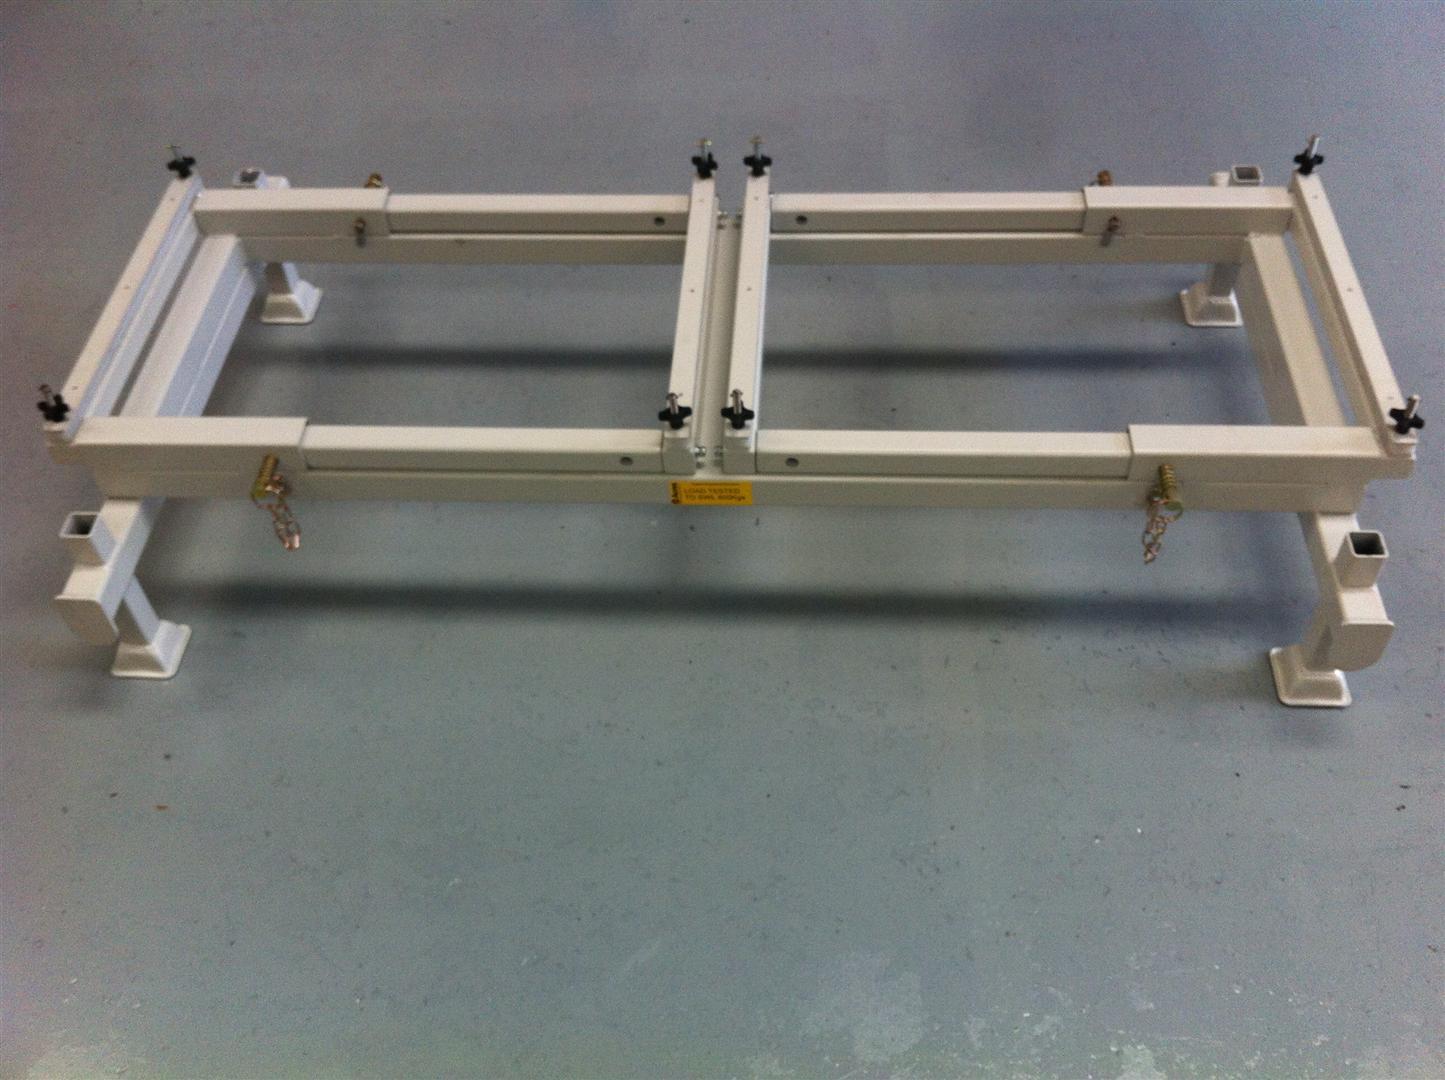 AD-132-2013-03 – Stator Coil Stackable Stillage